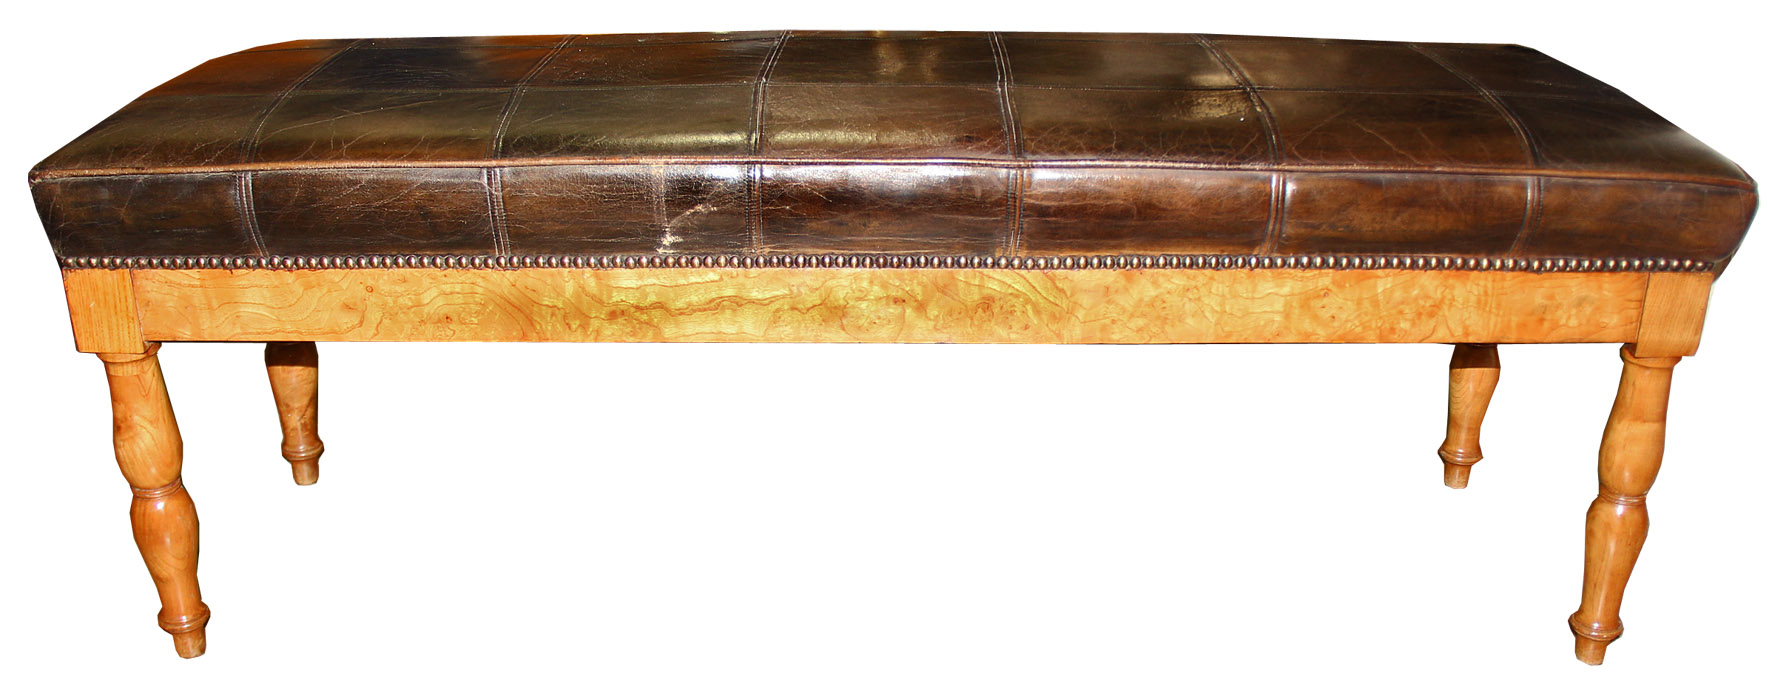 A 19th Century French Charles X Burl-Elm Bench No. 1449